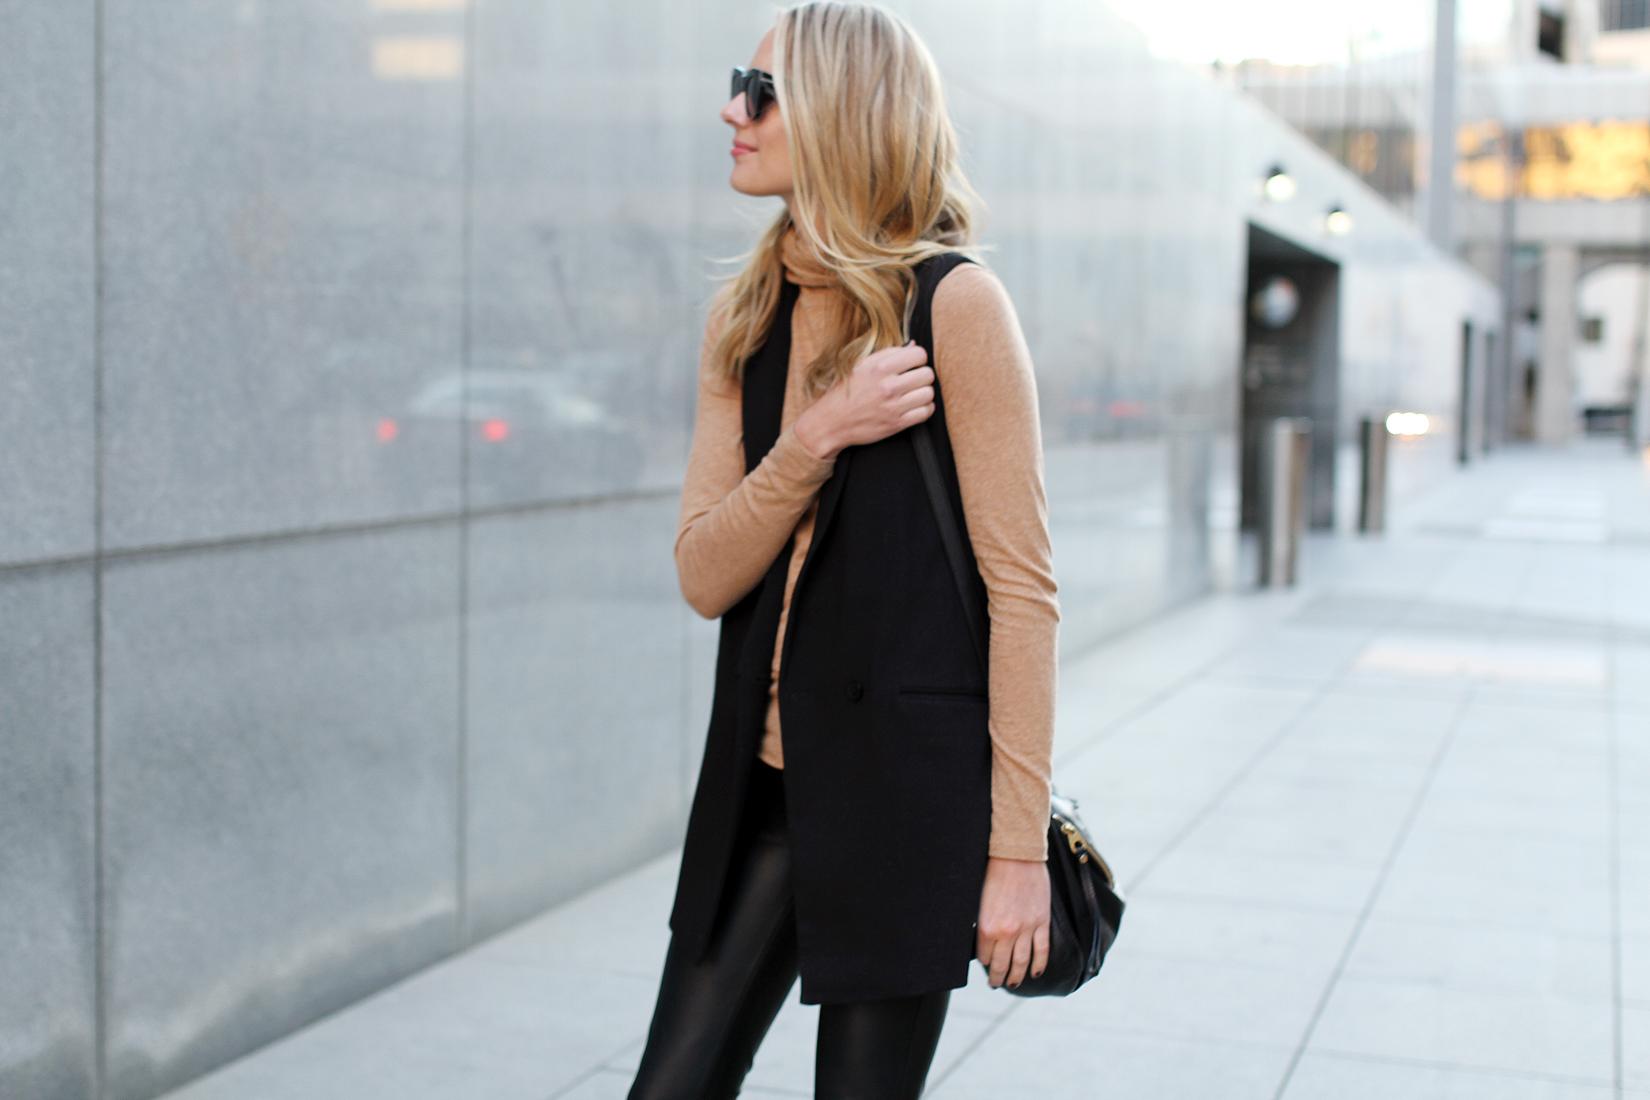 fashion-jackson-madewell-camel-turtleneck-black-long-vest-black-faux-leather-skinny-pants